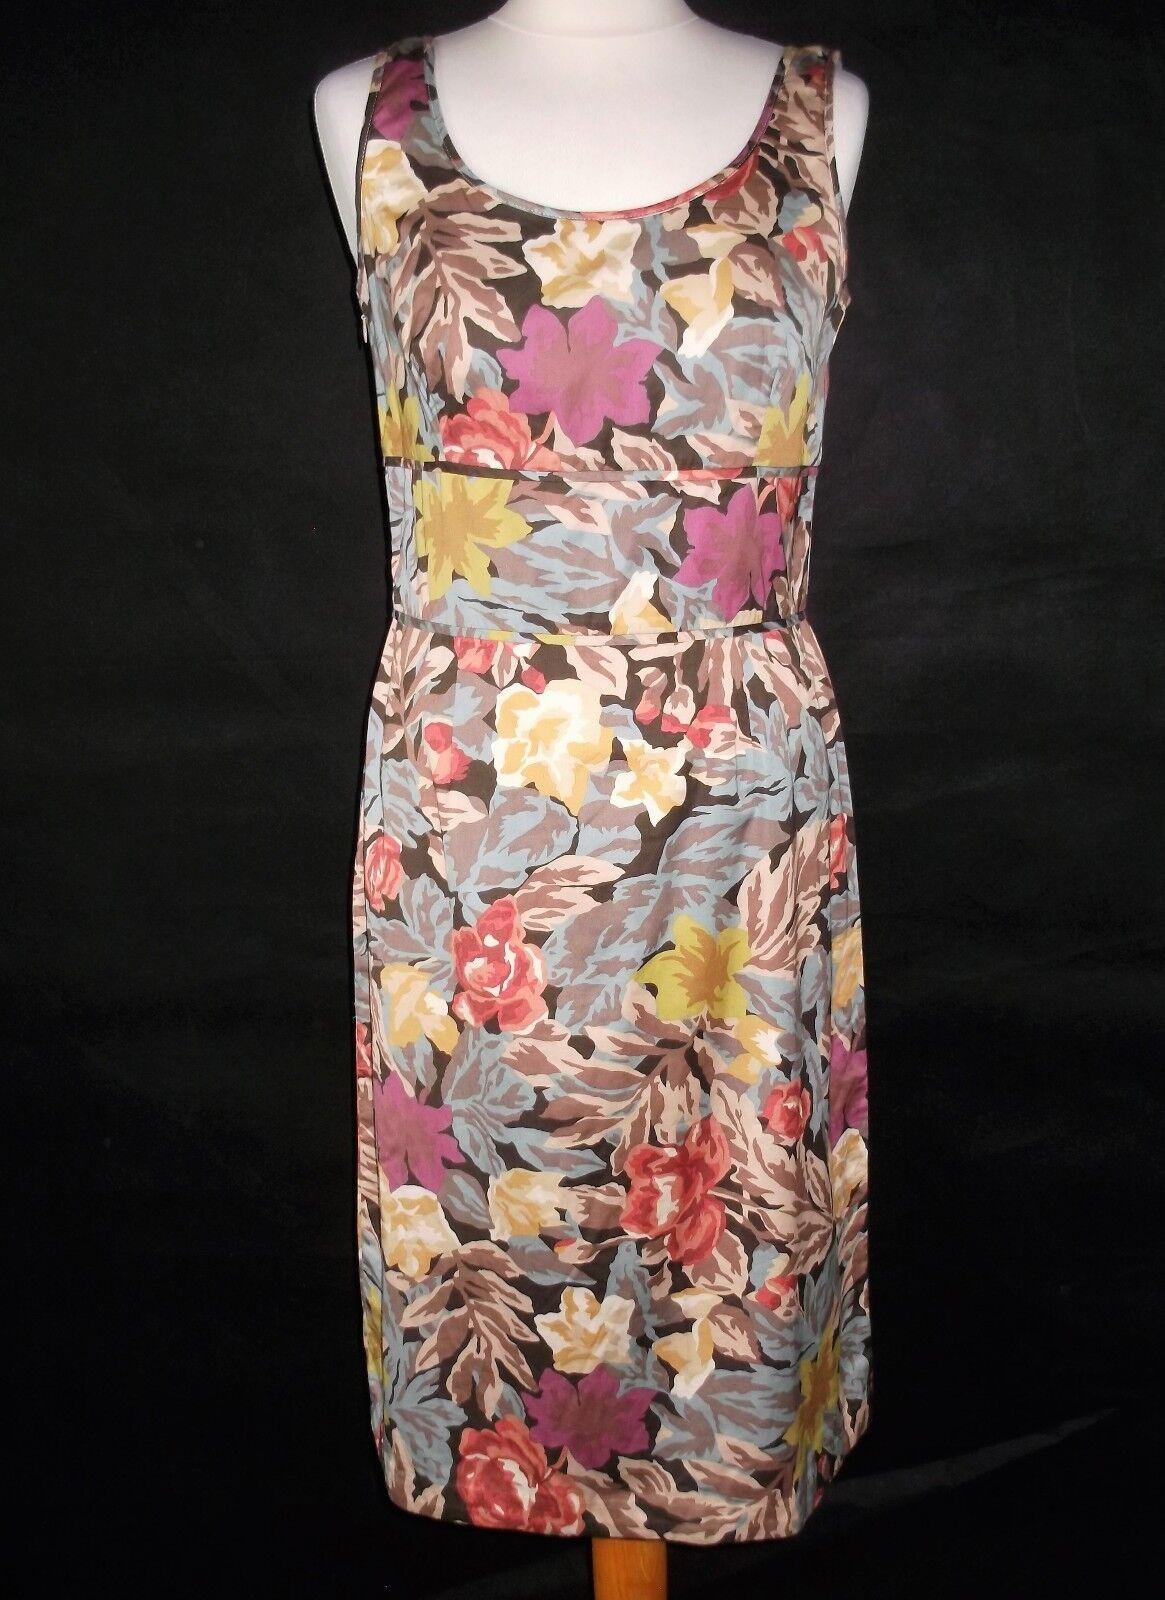 PERUVIAN CONNECTION Vestido Ceñido De Algodón Pima Pima Pima Estampado De Flores Talla 8 e77992